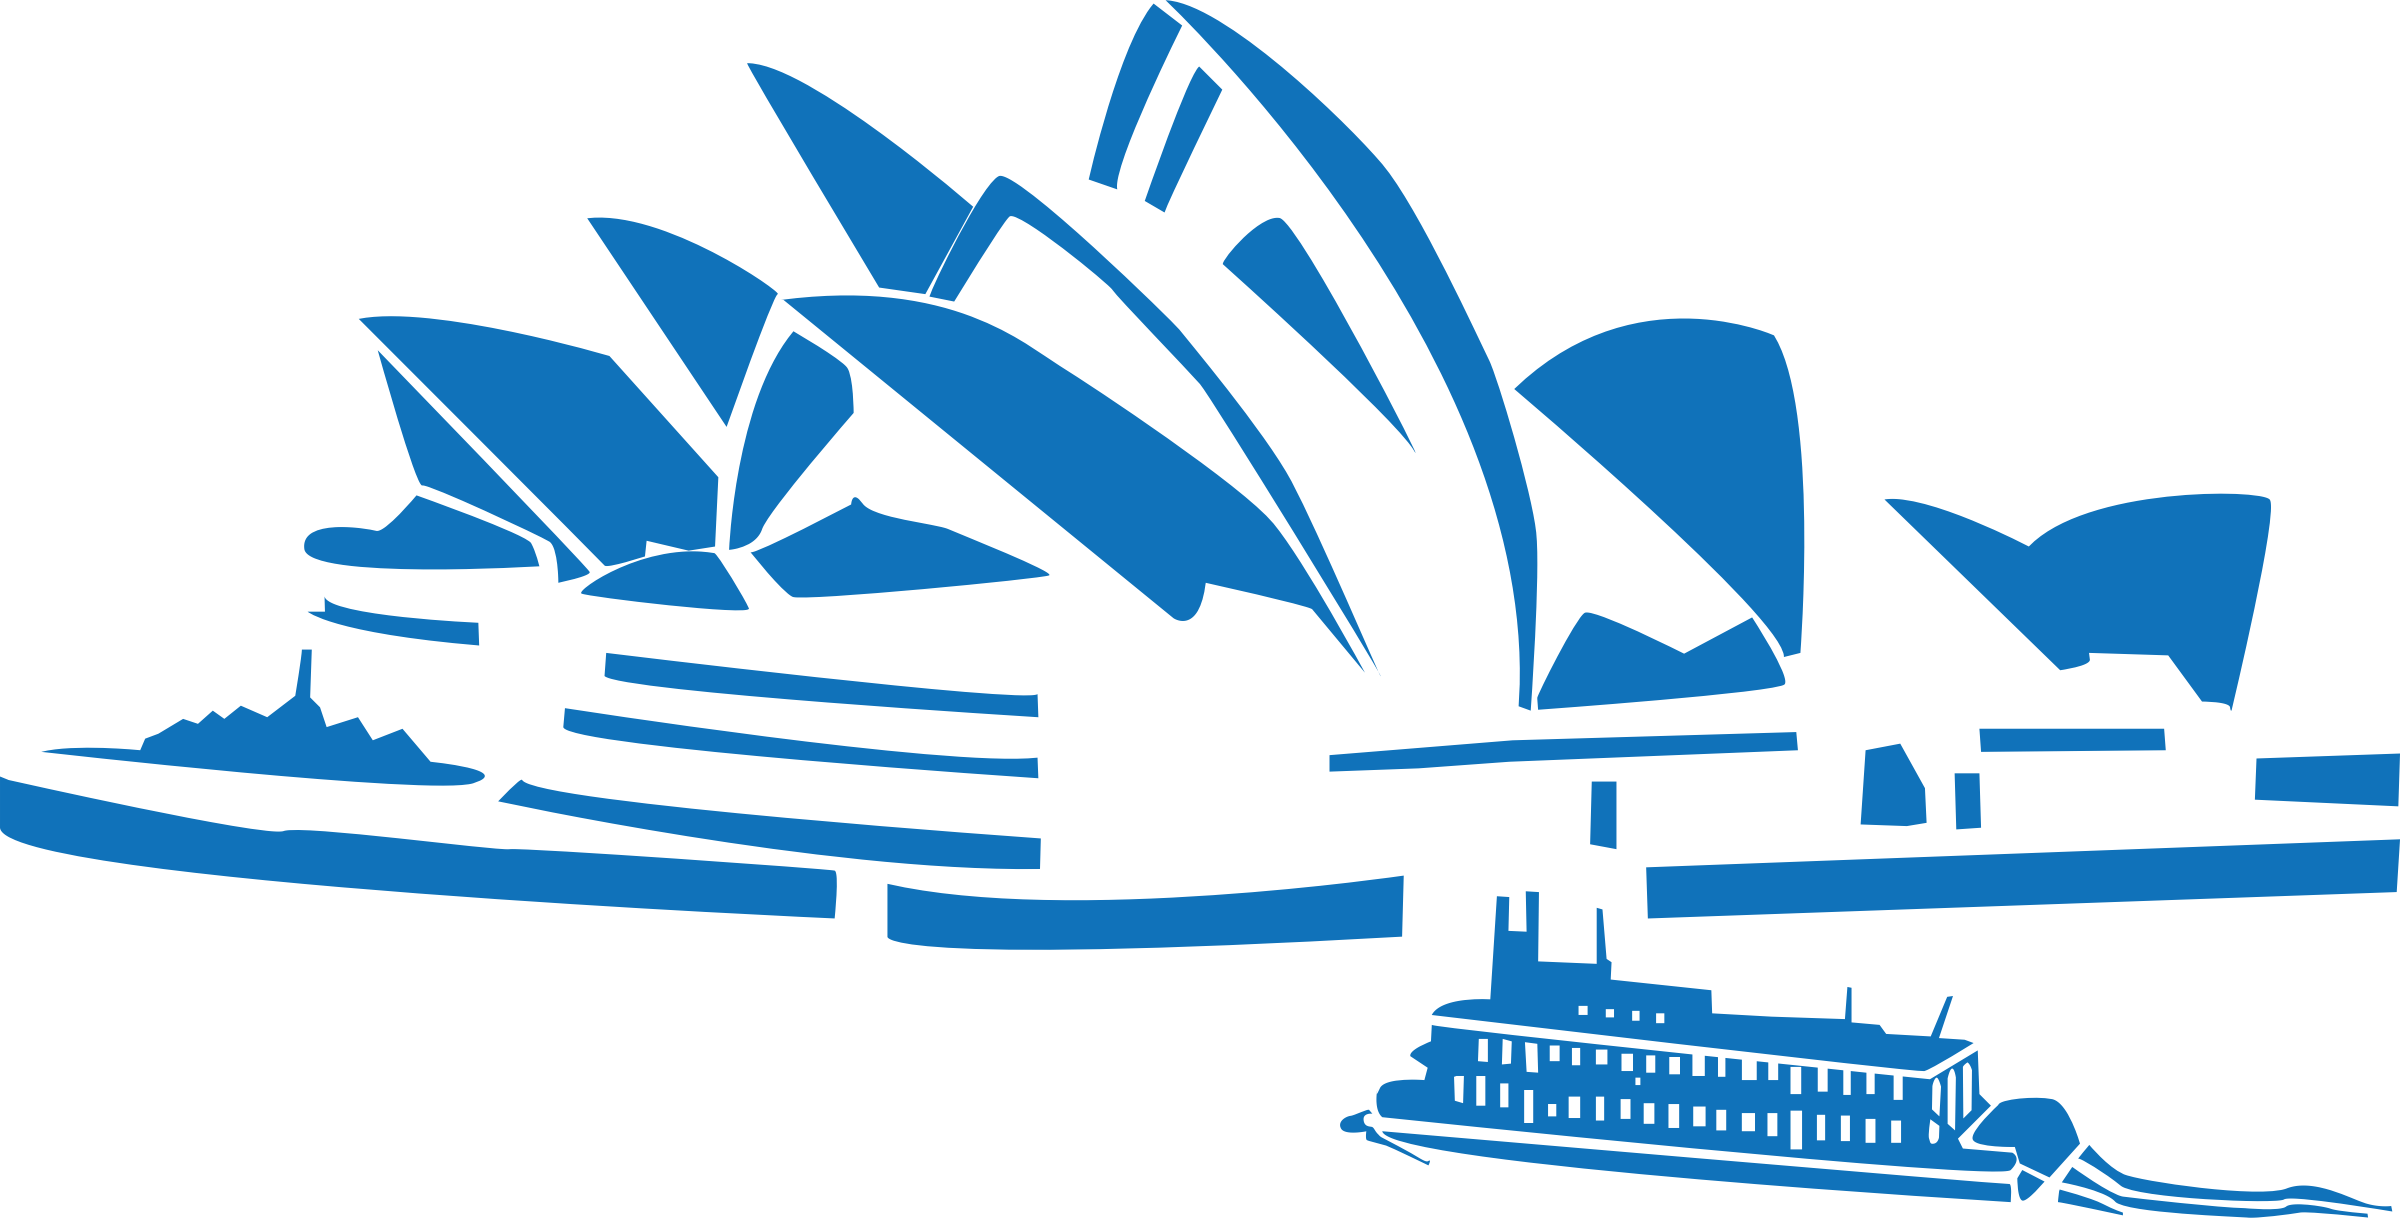 Sydney transparent PNG images.